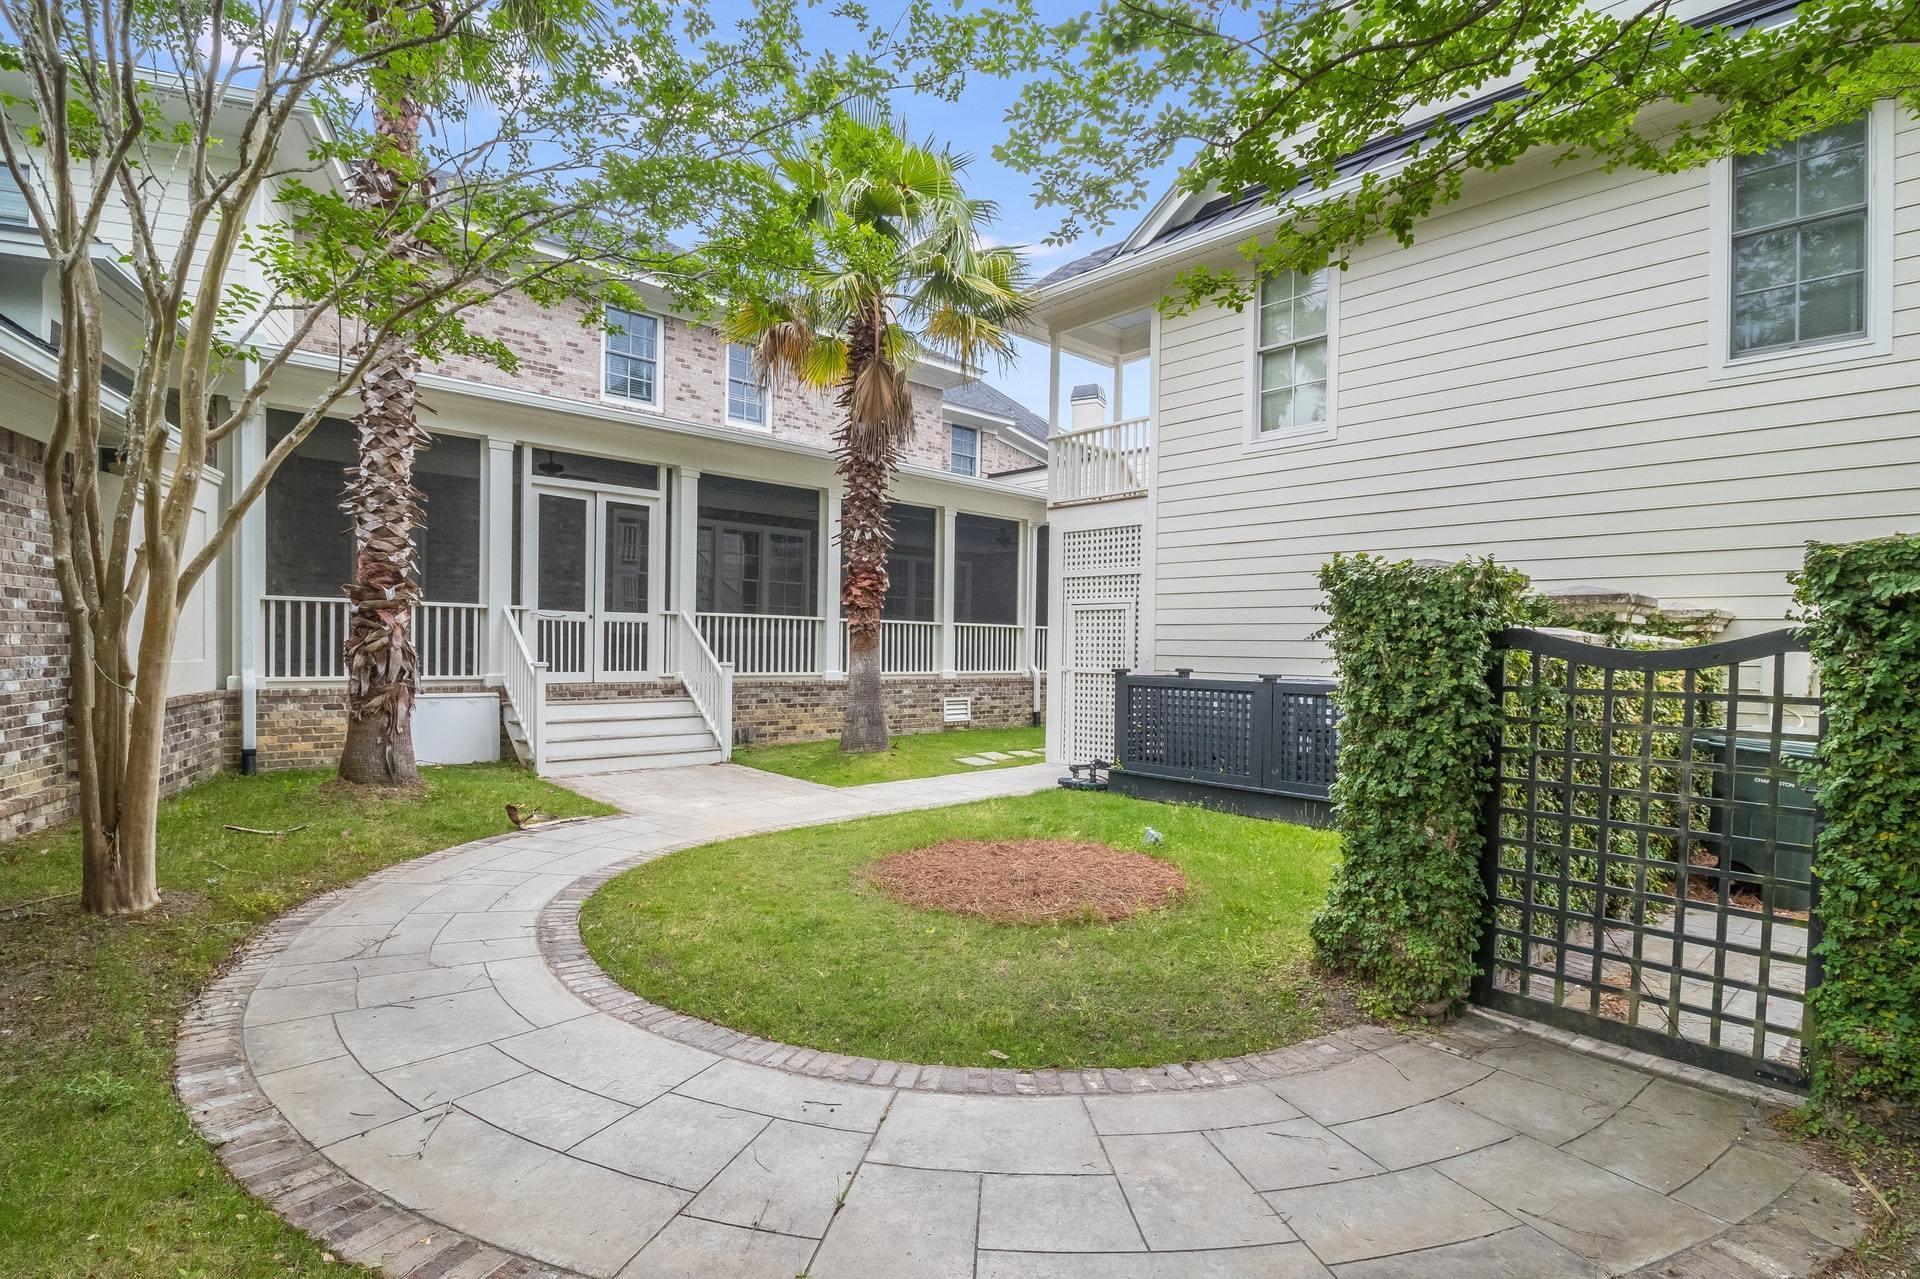 Daniel Island Park Homes For Sale - 32 Grove Lane, Daniel Island, SC - 15